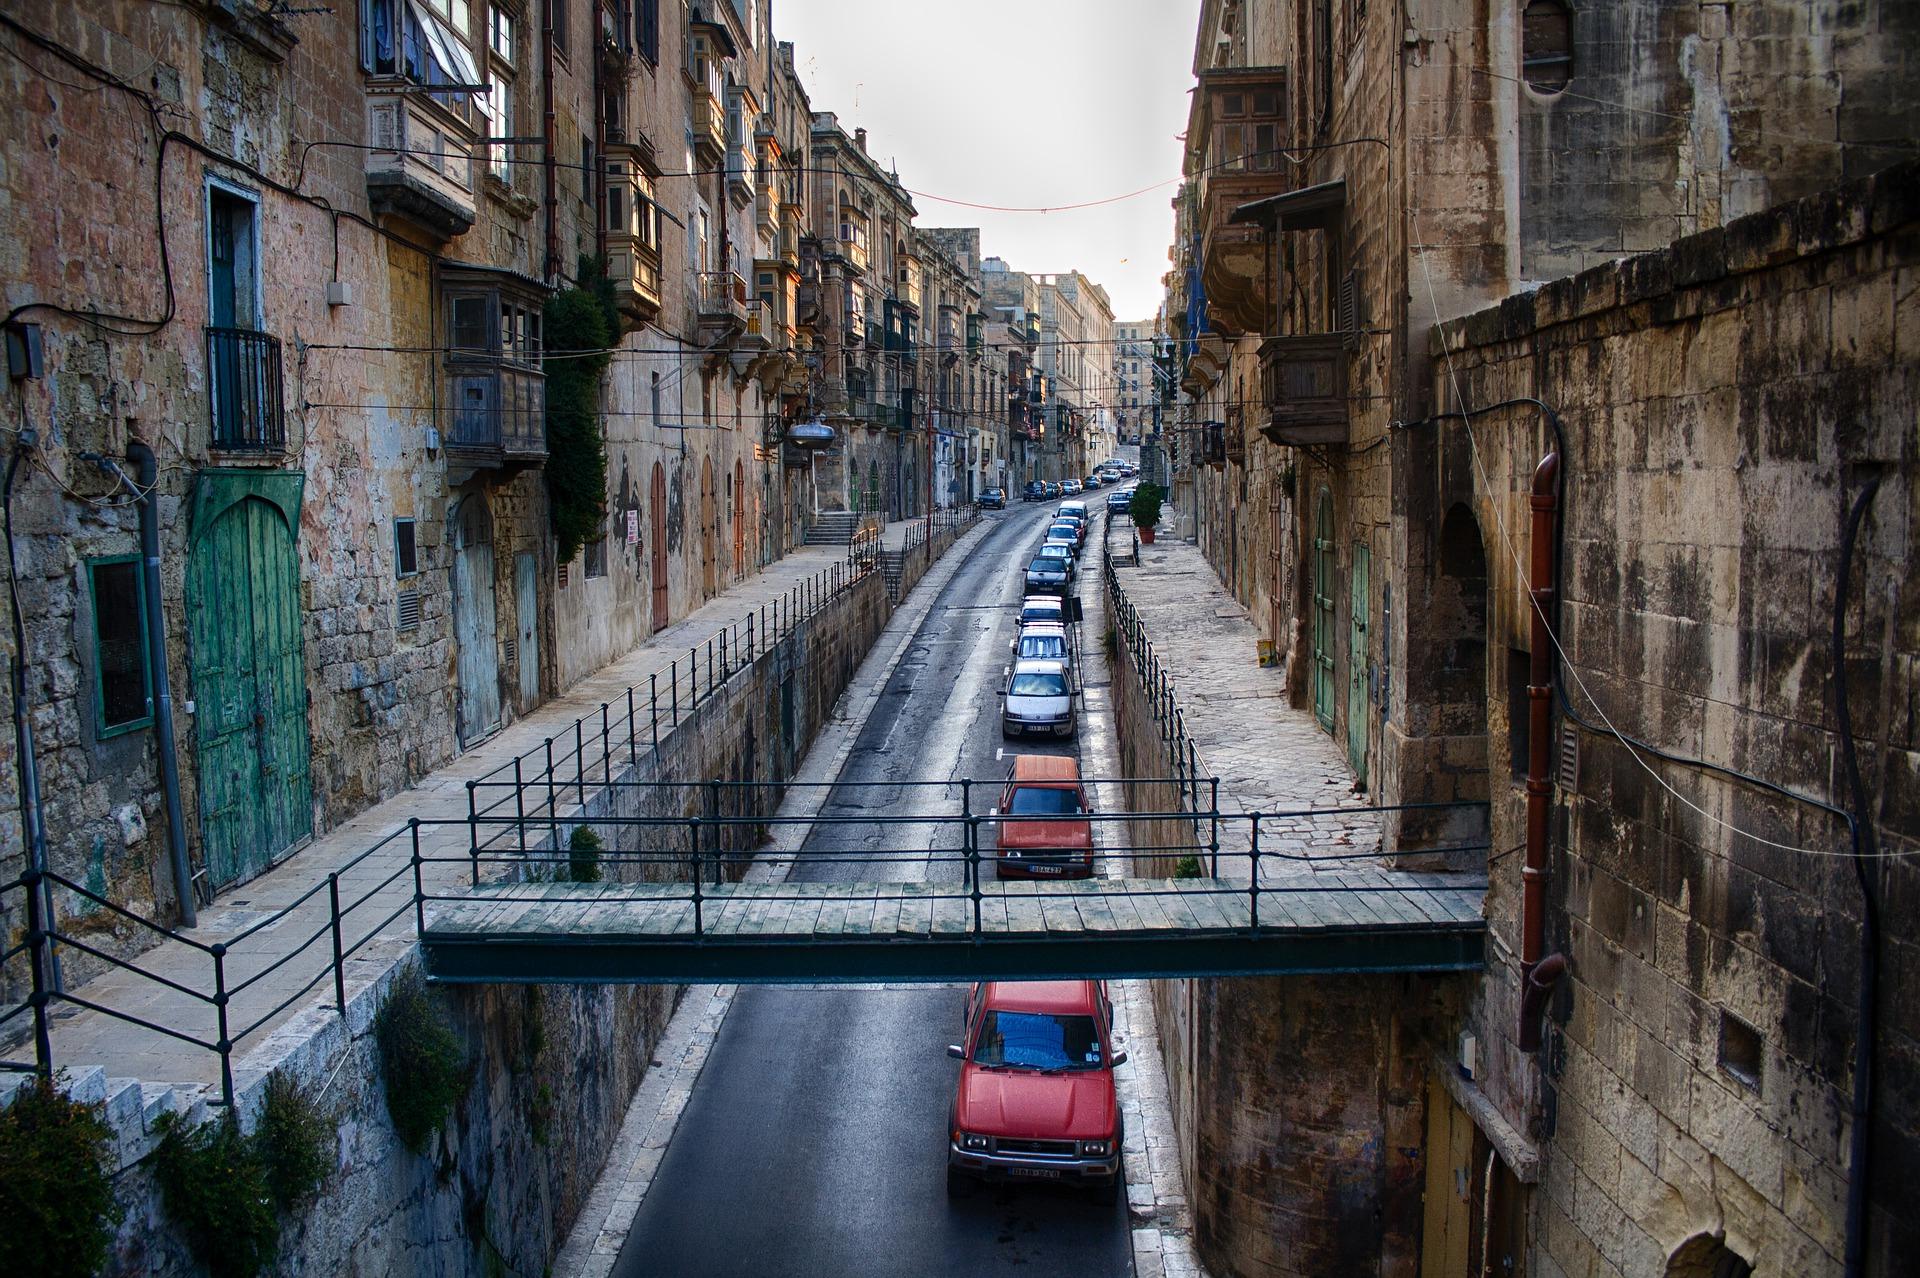 Road Malta photo by chrisjzammit